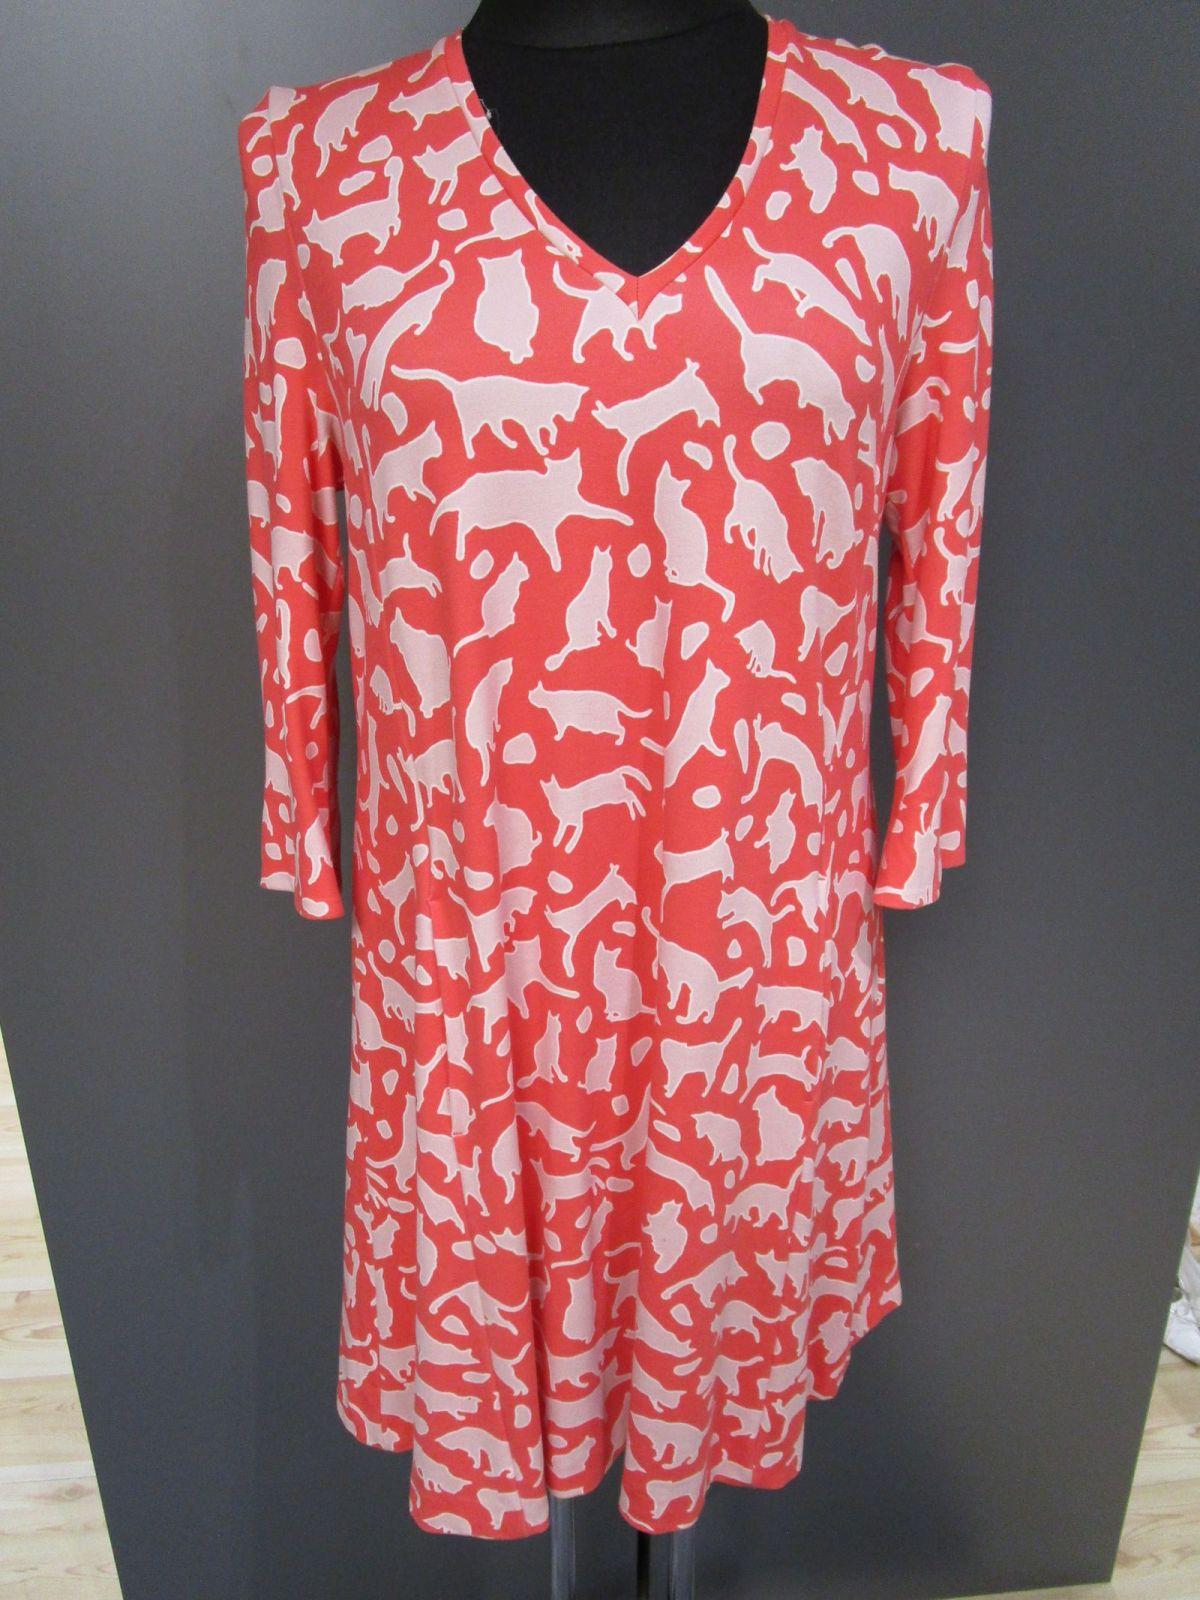 marccain sweatshirt kleid stretchig rot katzen gr.n5/42 (m50